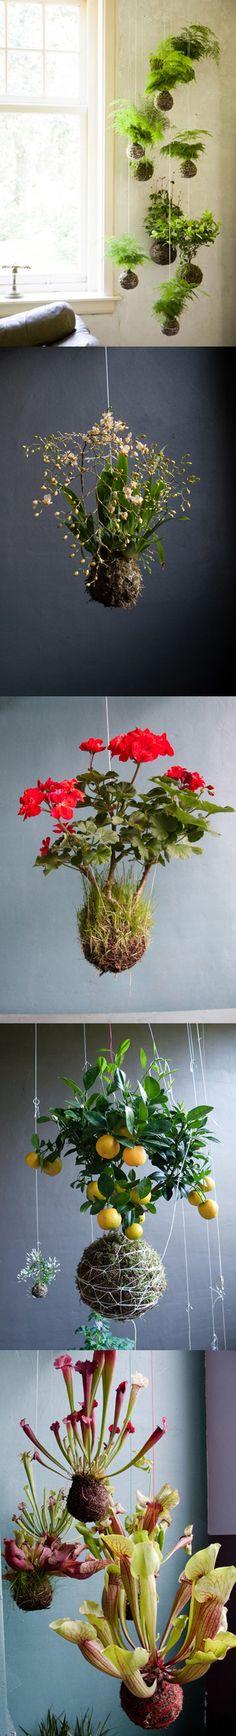 34-beautiful-hanging-garden-ideas-33